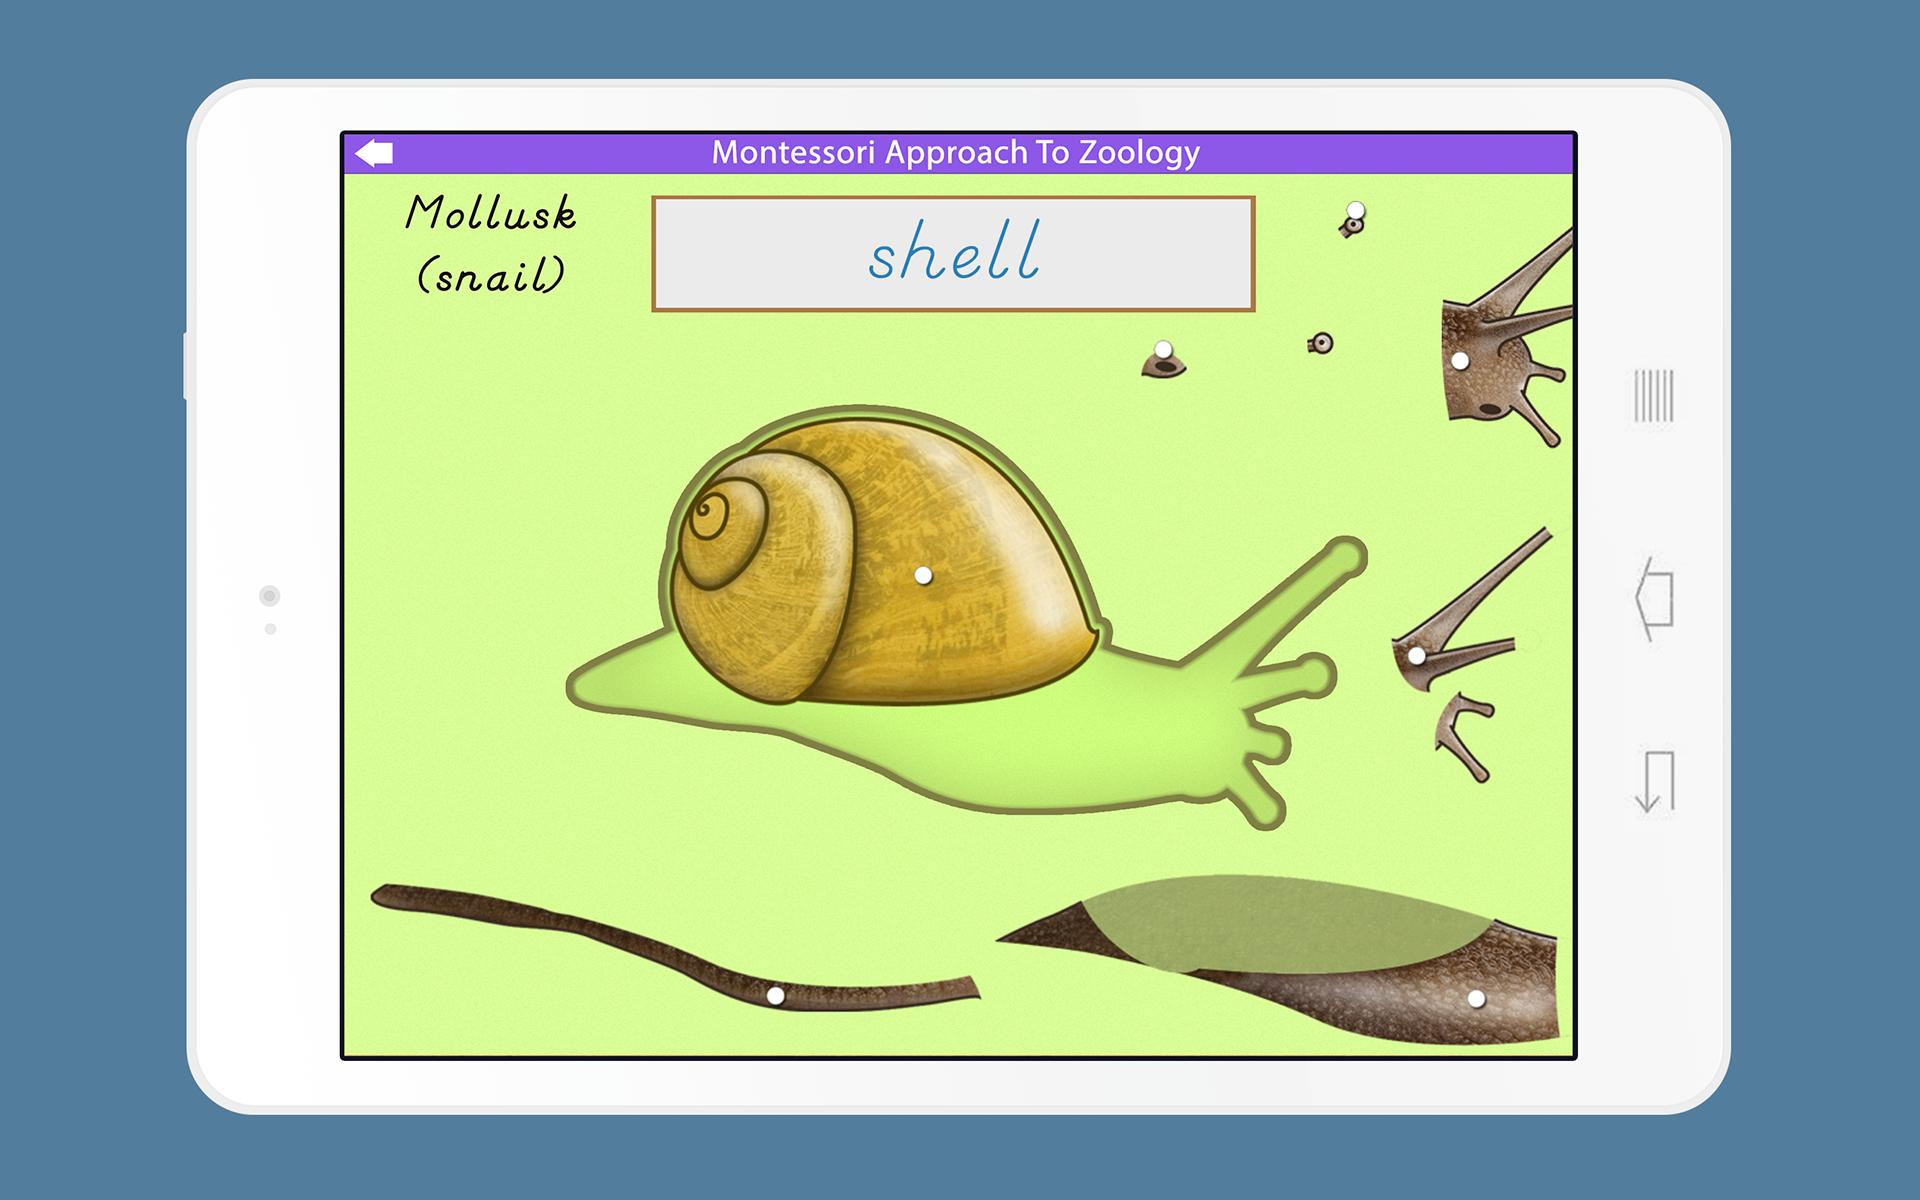 amazon com: montessori zoology - parts of animals - invertebrates: appstore  for android